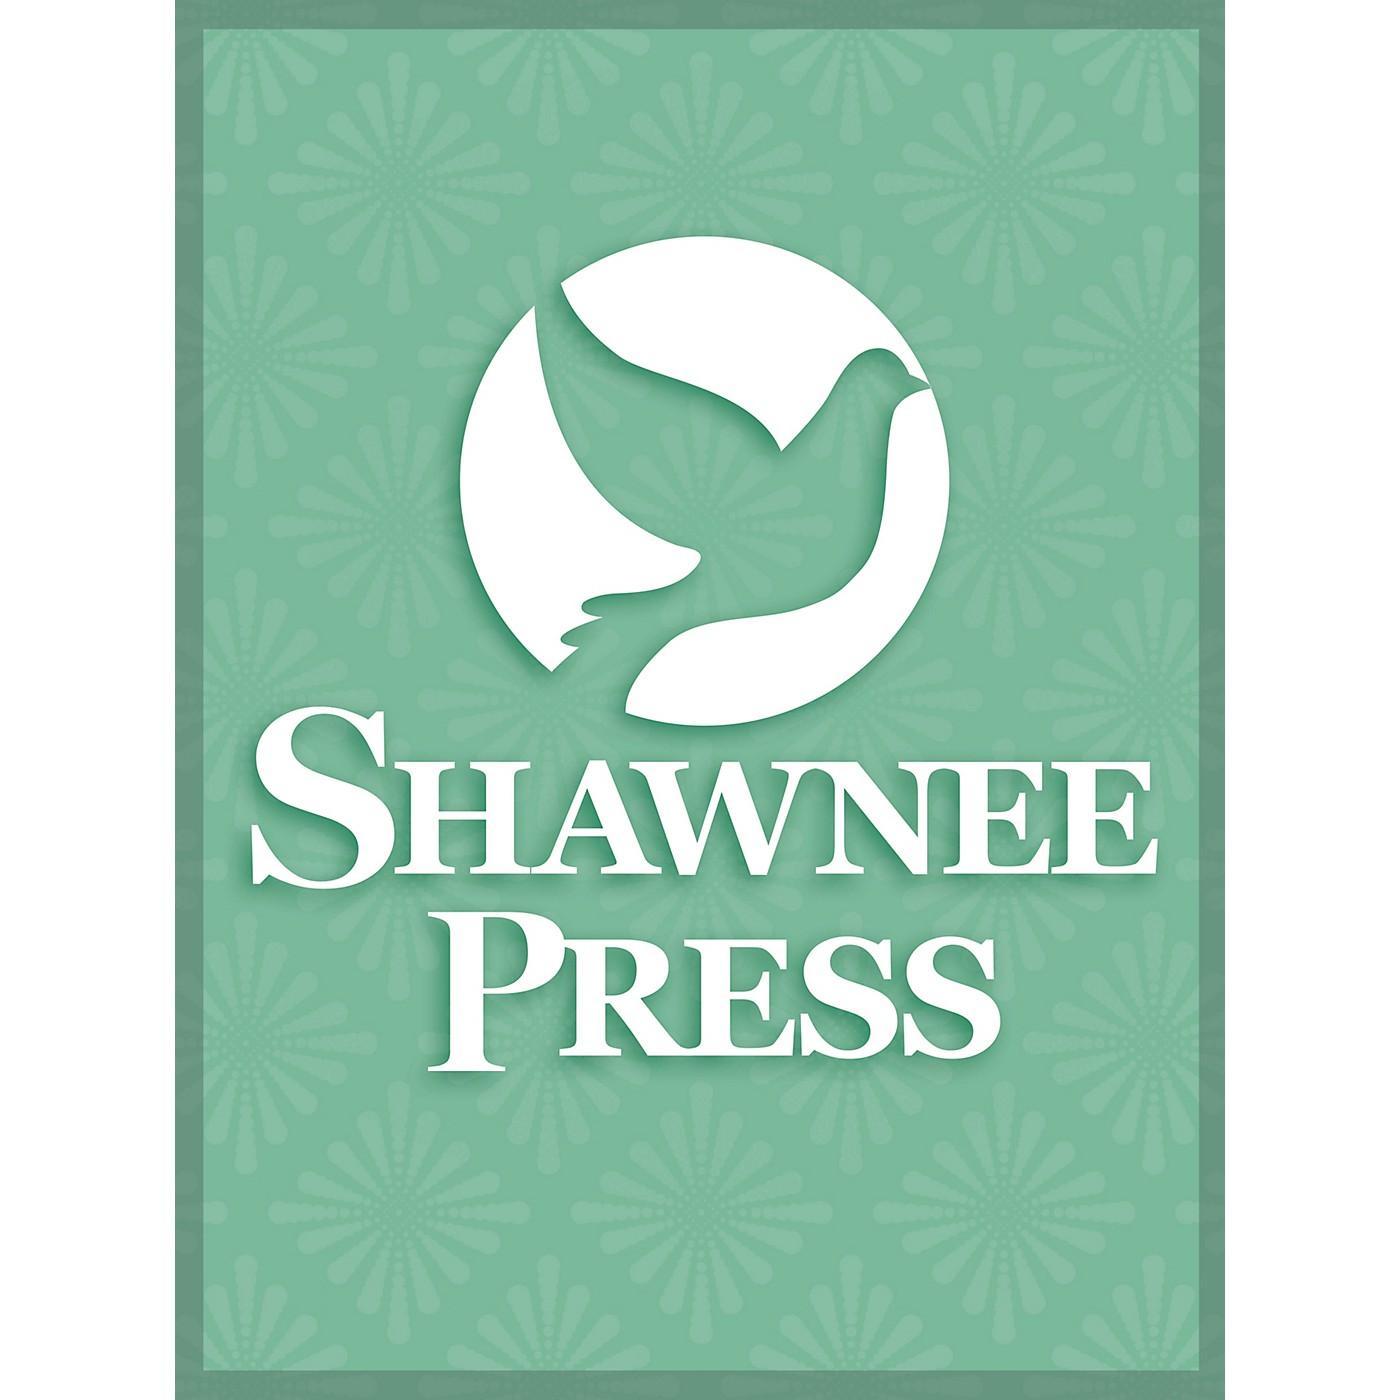 Shawnee Press Stephen Foster Medley Shawnee Press Series thumbnail